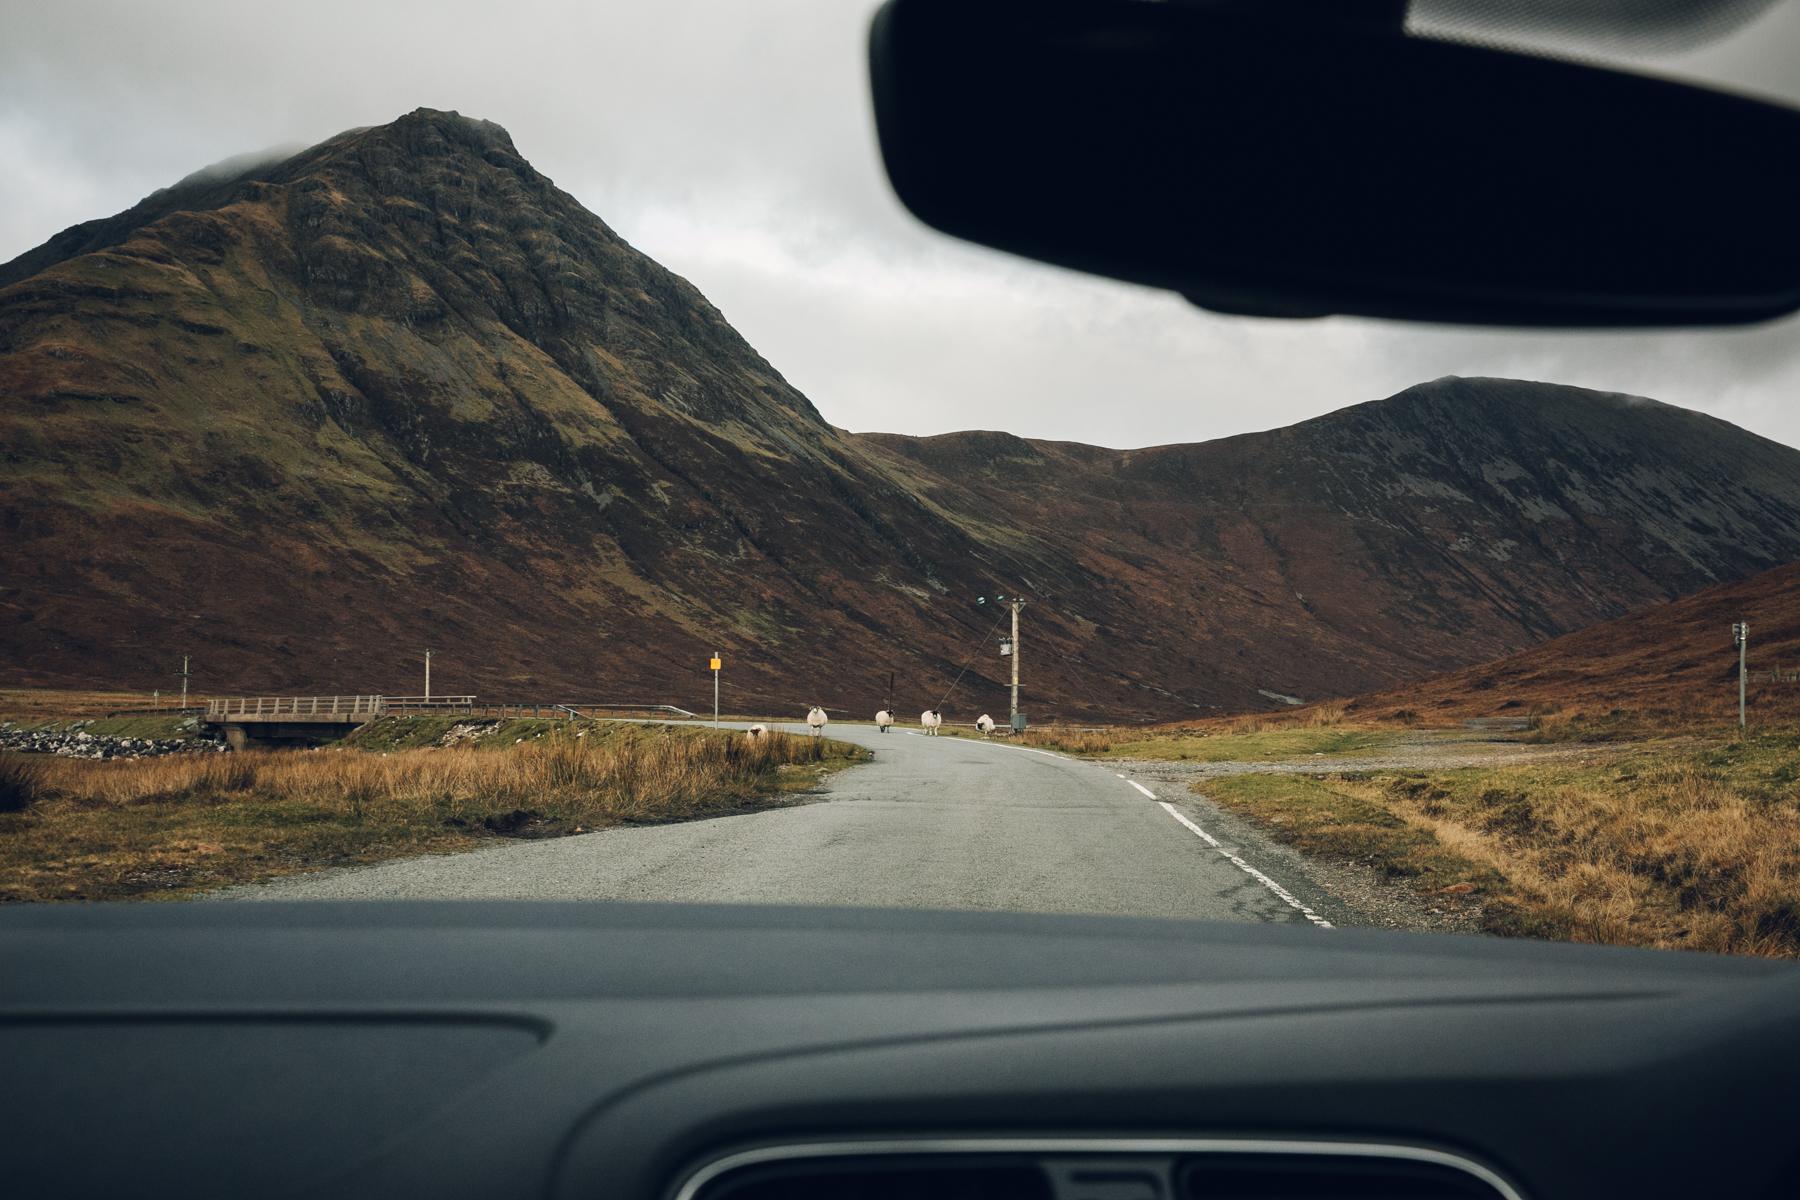 Sheep-shaped traffic jams on the Isle of Skye.